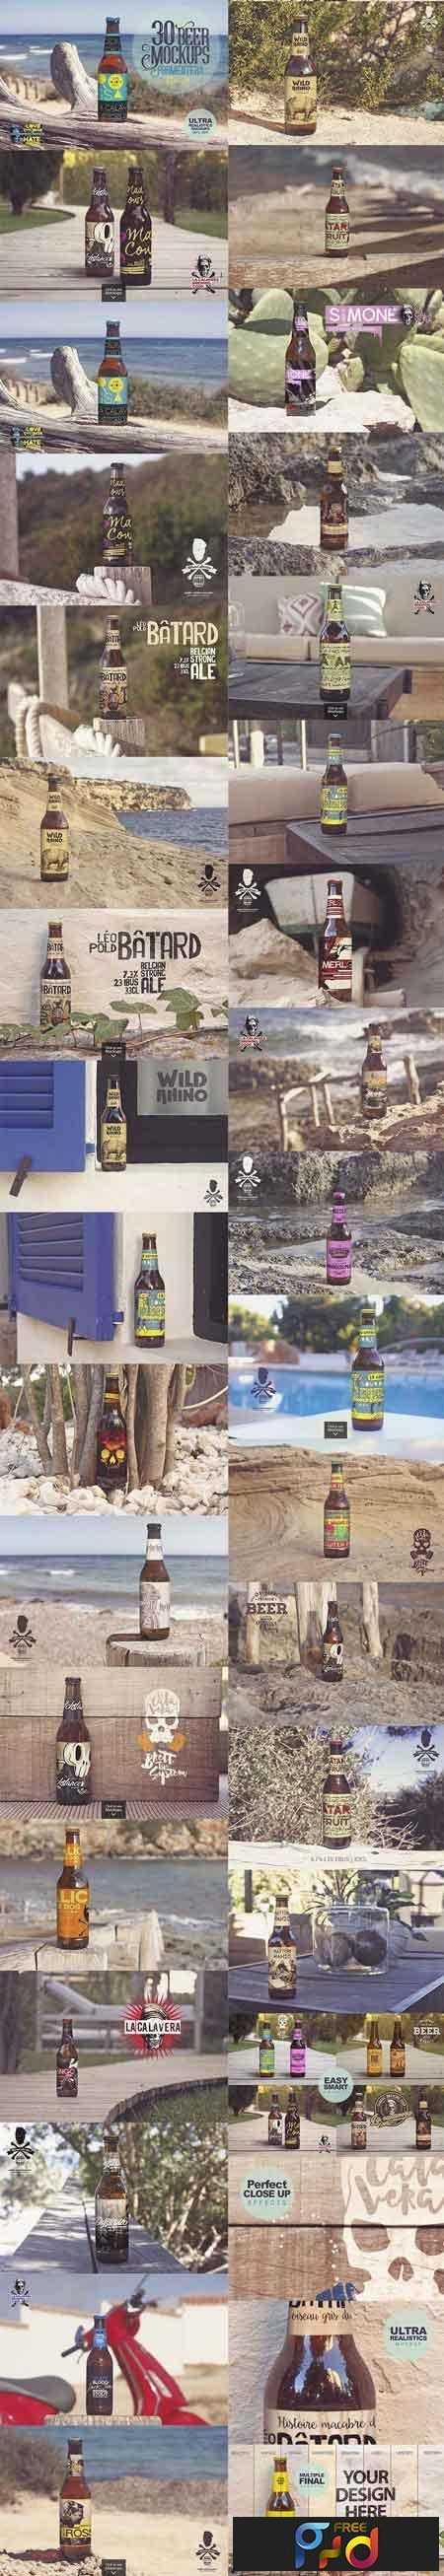 1807141 30 Beer Mockups in Formentera 2665727 1